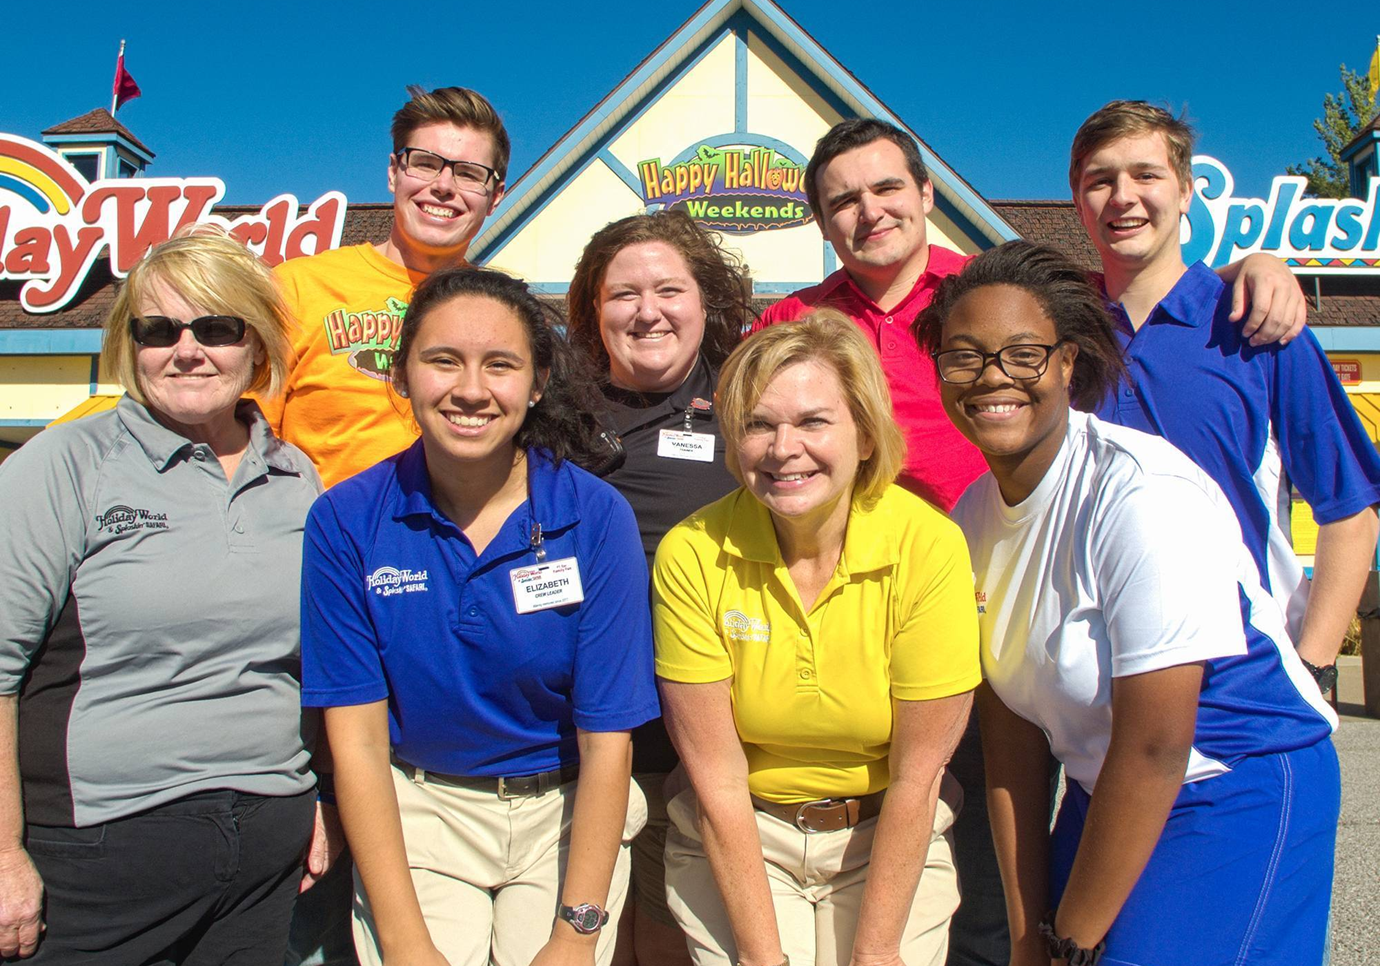 Holiday World & Splashin' Safari to Hire 2,000+ Seasonal Employees for 2019